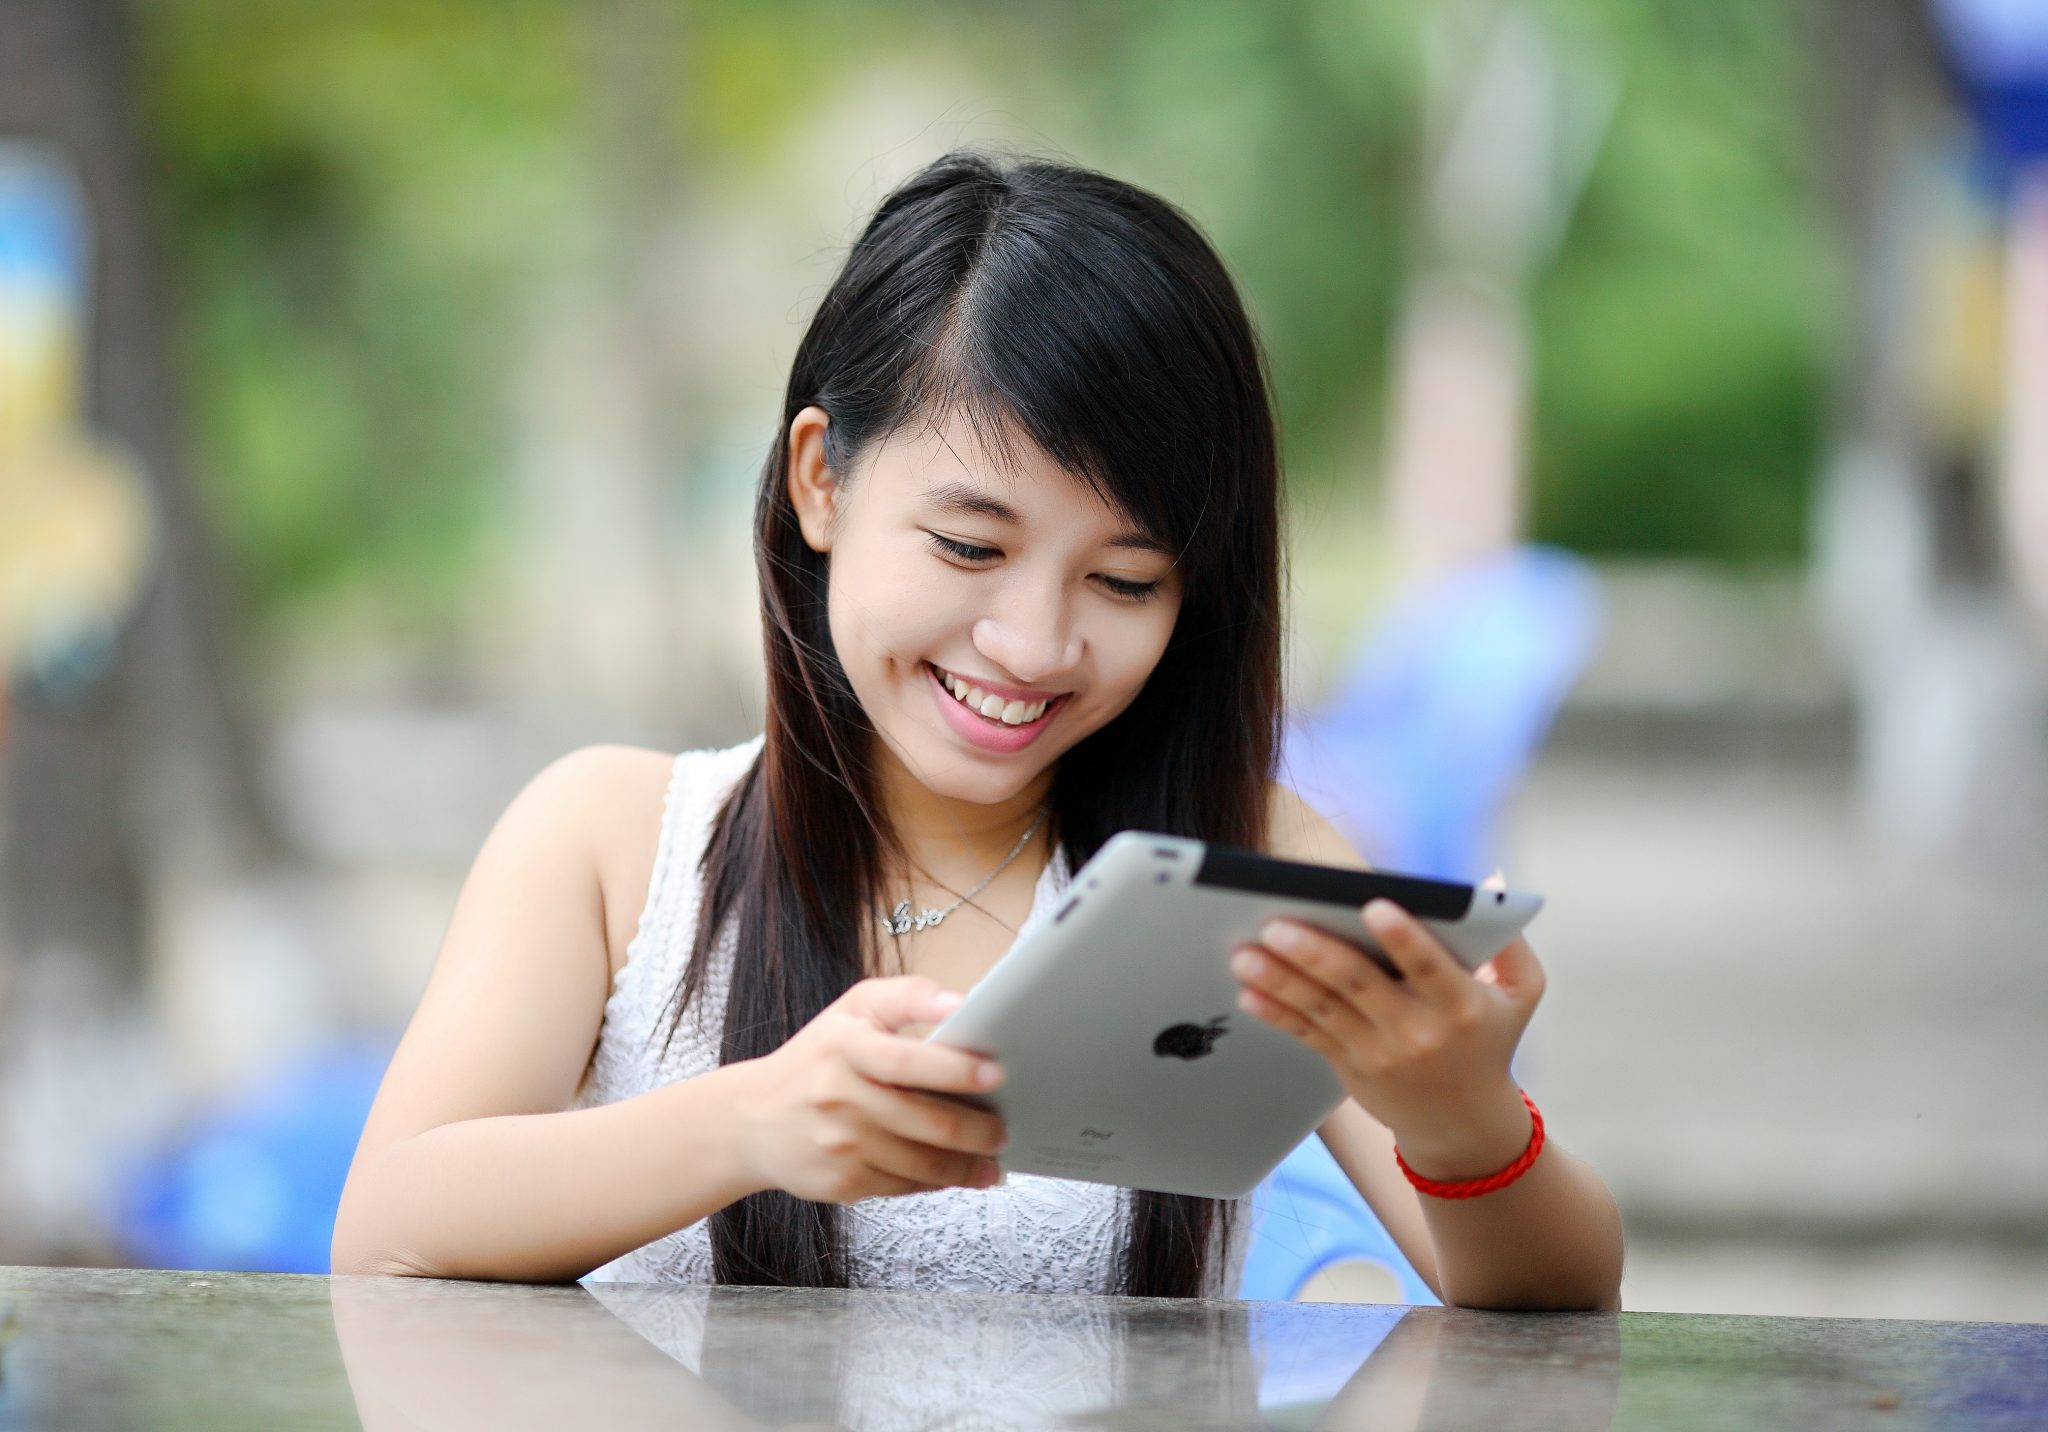 tablet woman happy - foto pubblicata da tatianaberlaffa.com